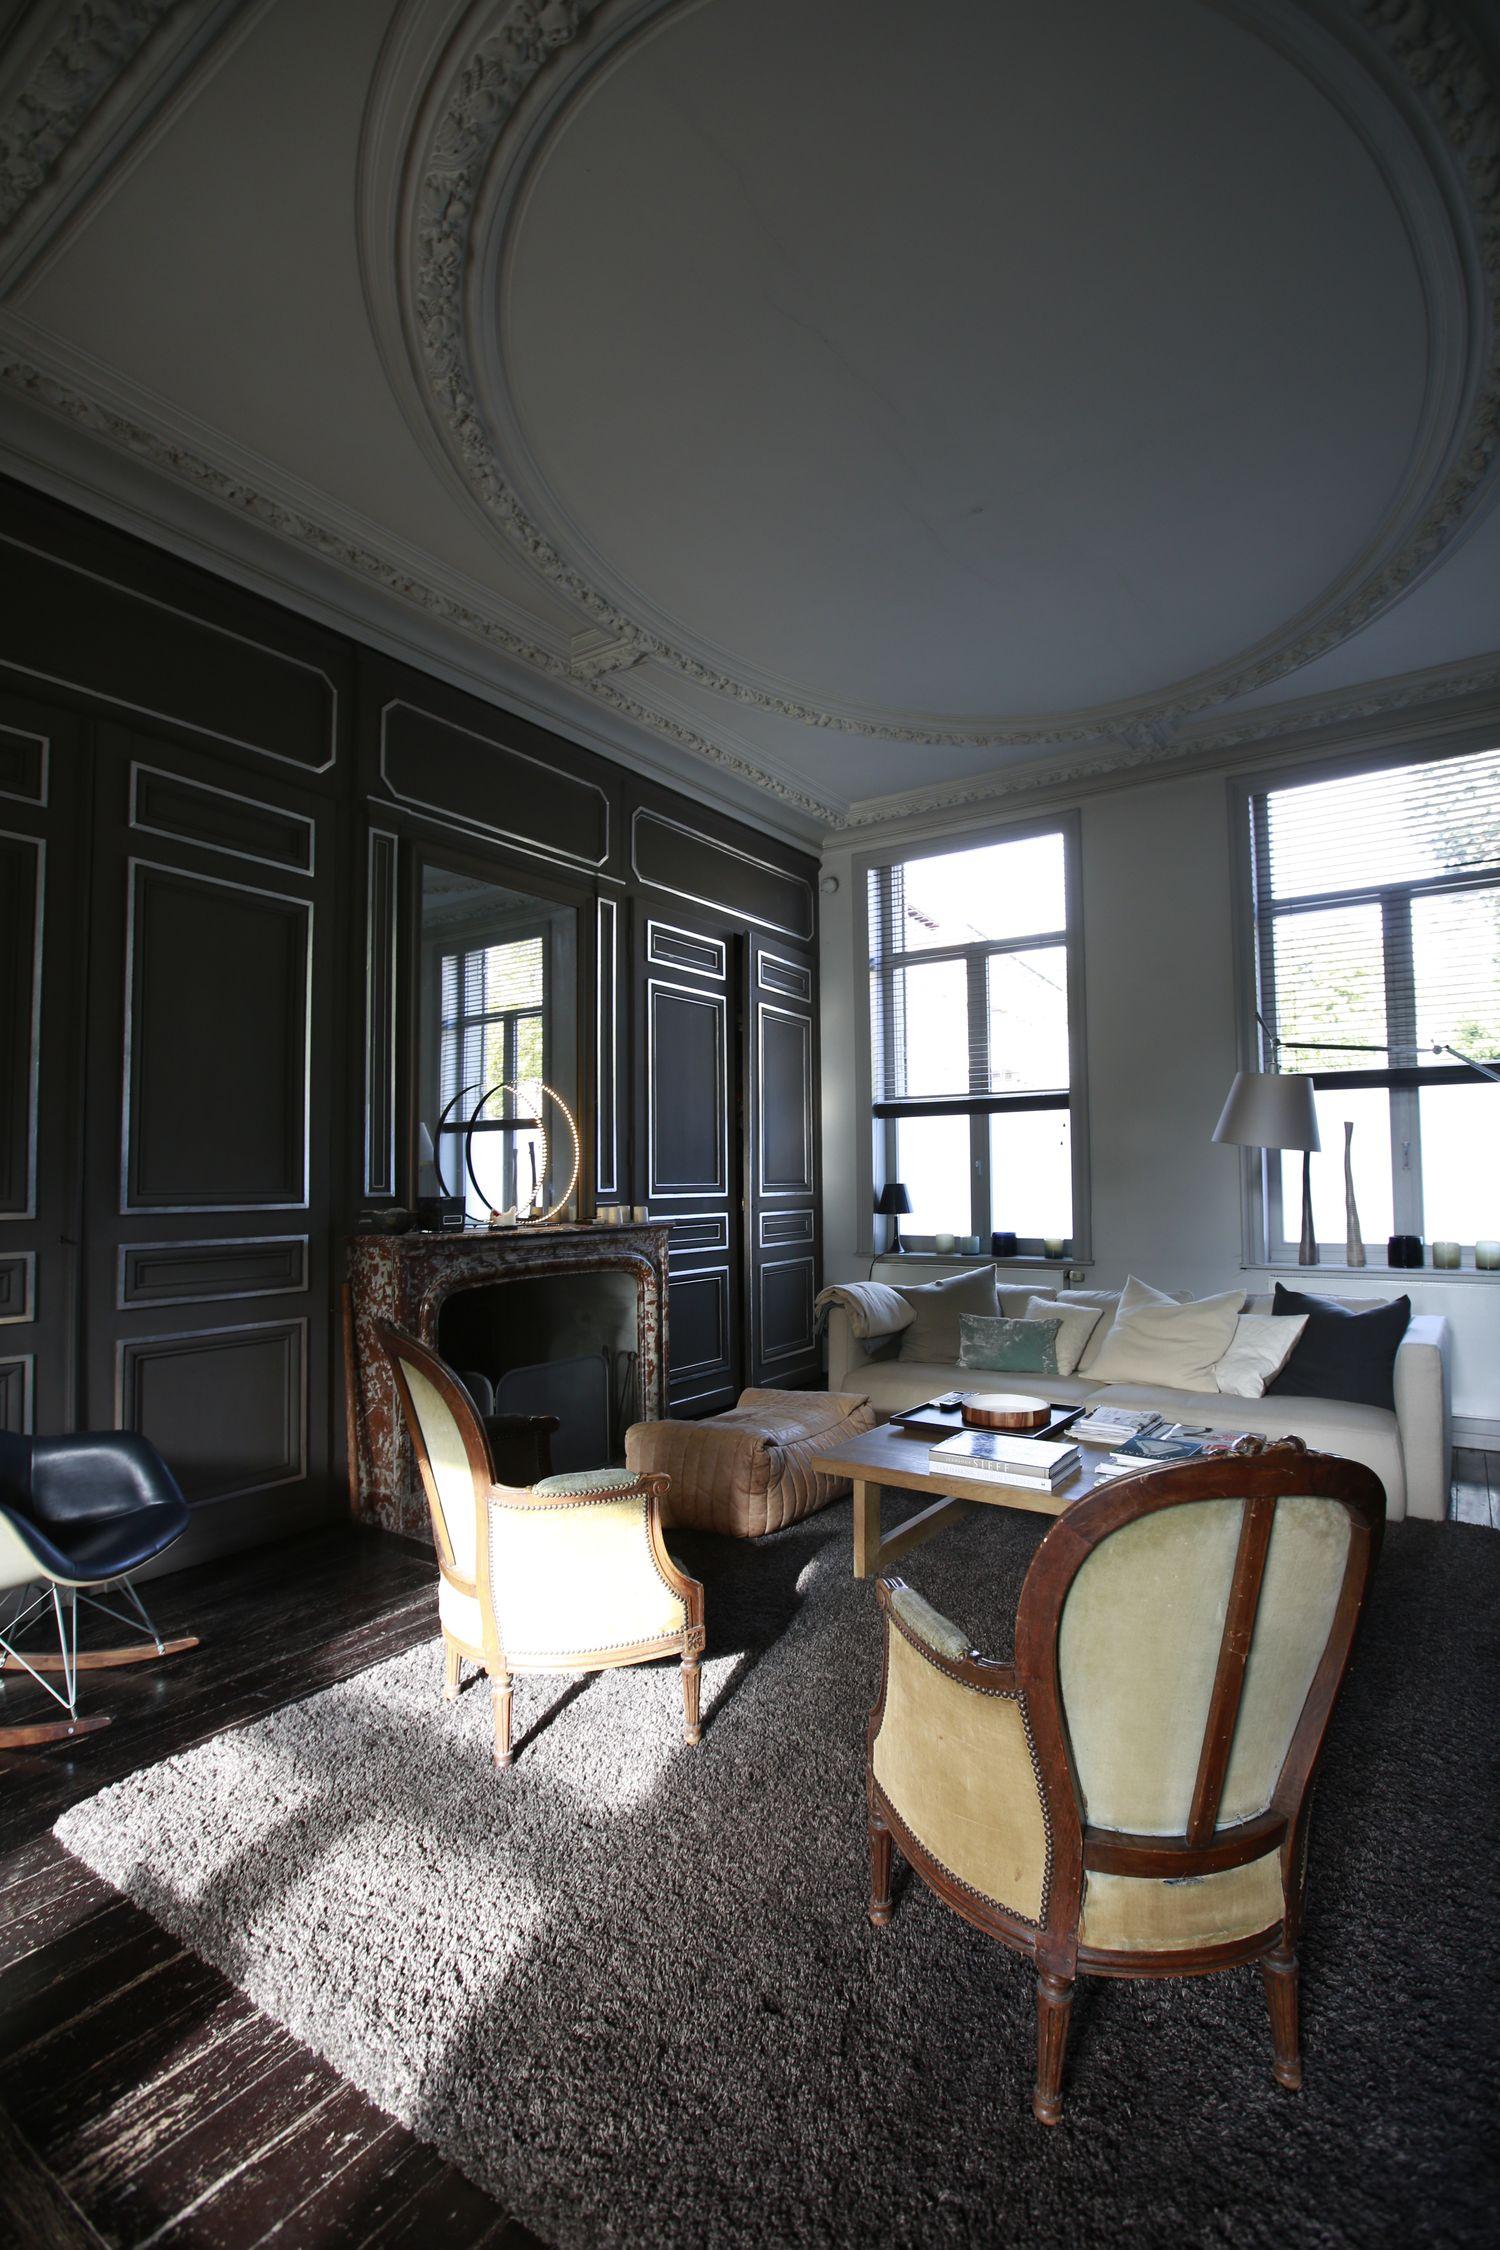 Une maison bourgeoise 19me sicle  Patrick Geffriaud Design